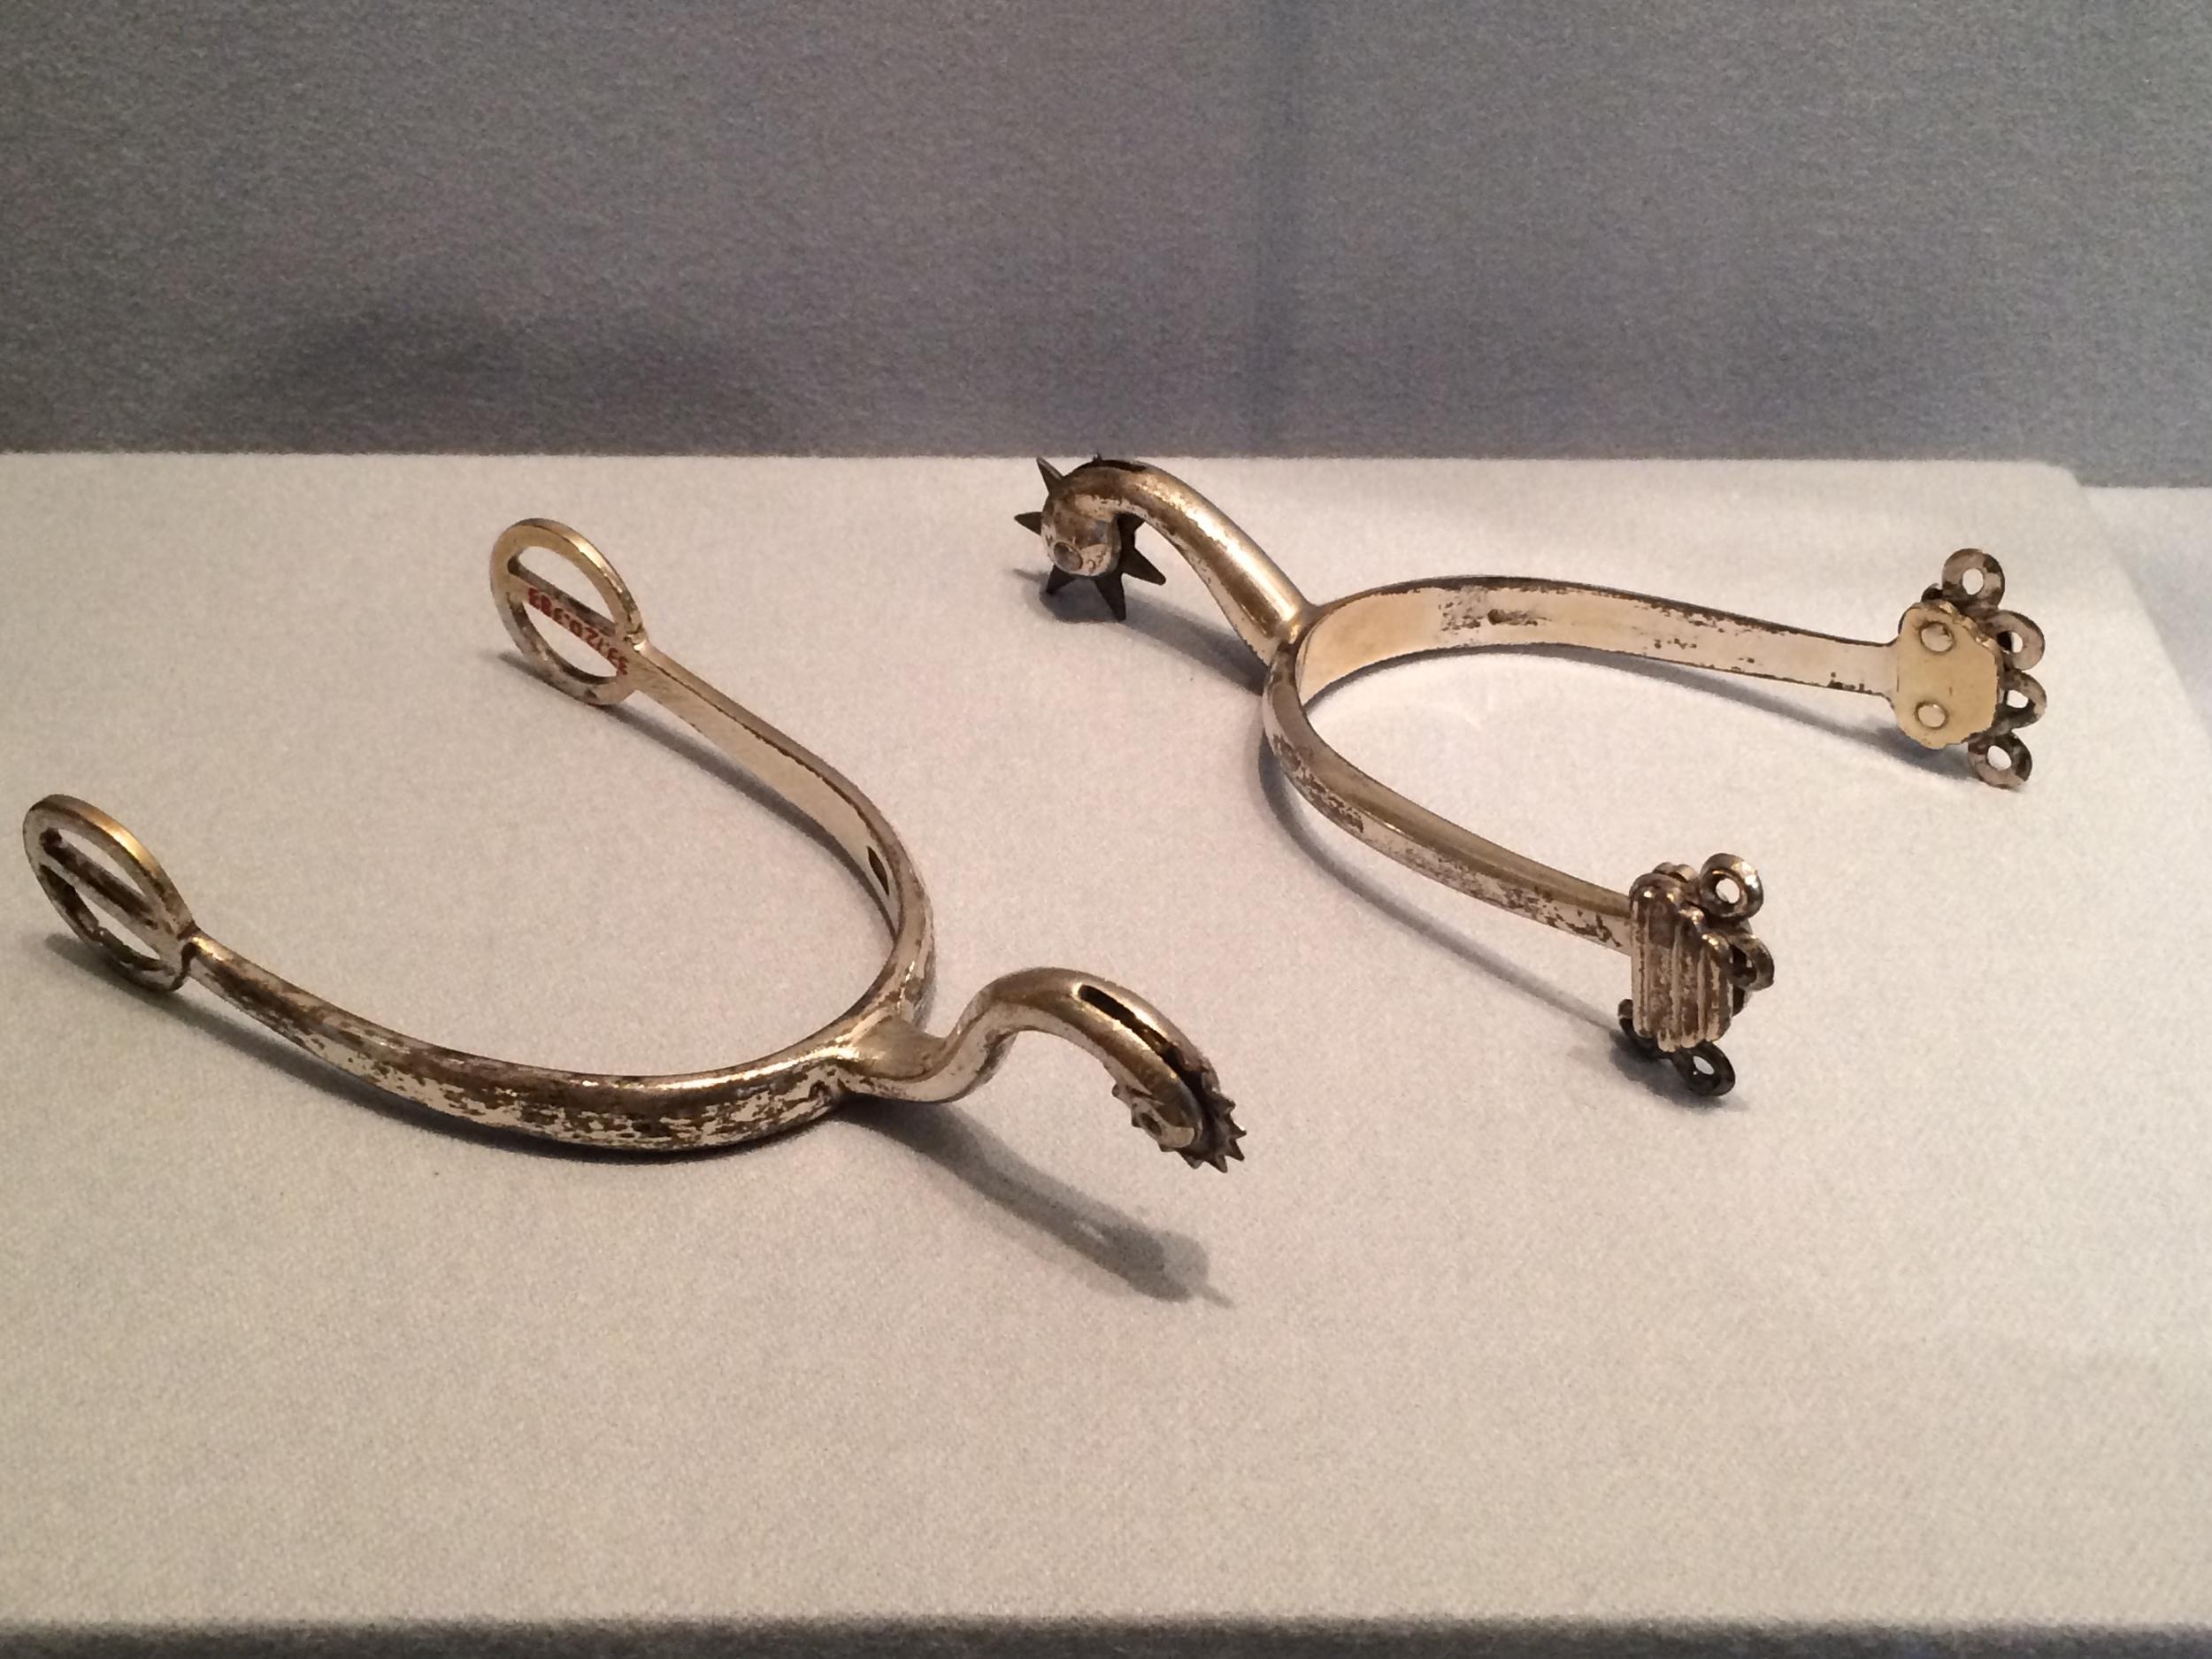 Paul Revere's spurs on display at the Metropolitan Museum of Art.